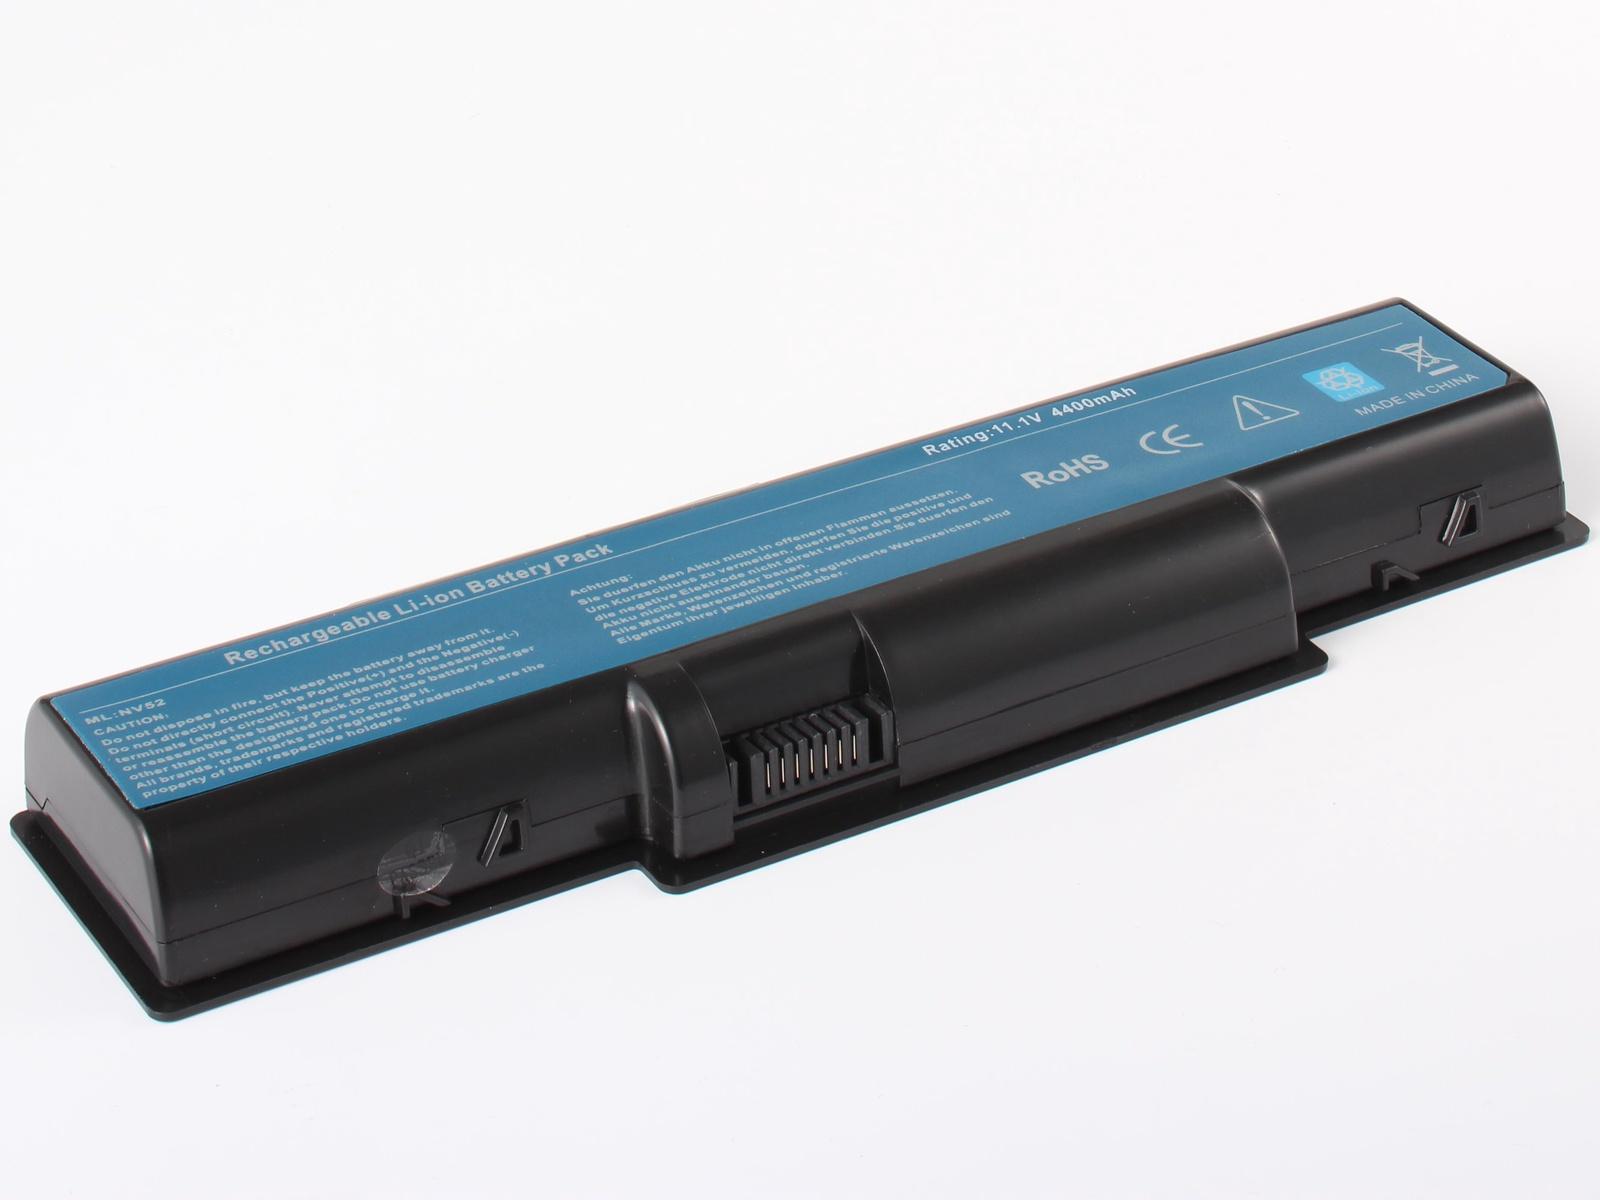 Аккумулятор для ноутбука AnyBatt для Acer eMachines E525, eMachines E725, Aspire 5732Z, eMachine G525, eMachines G525, Aspire 5541G, Aspire 5541, eMachines E527, Aspire 5732ZG, eMachine G725, eMachines G725, Aspire 5532 монитор emachines e220hqv